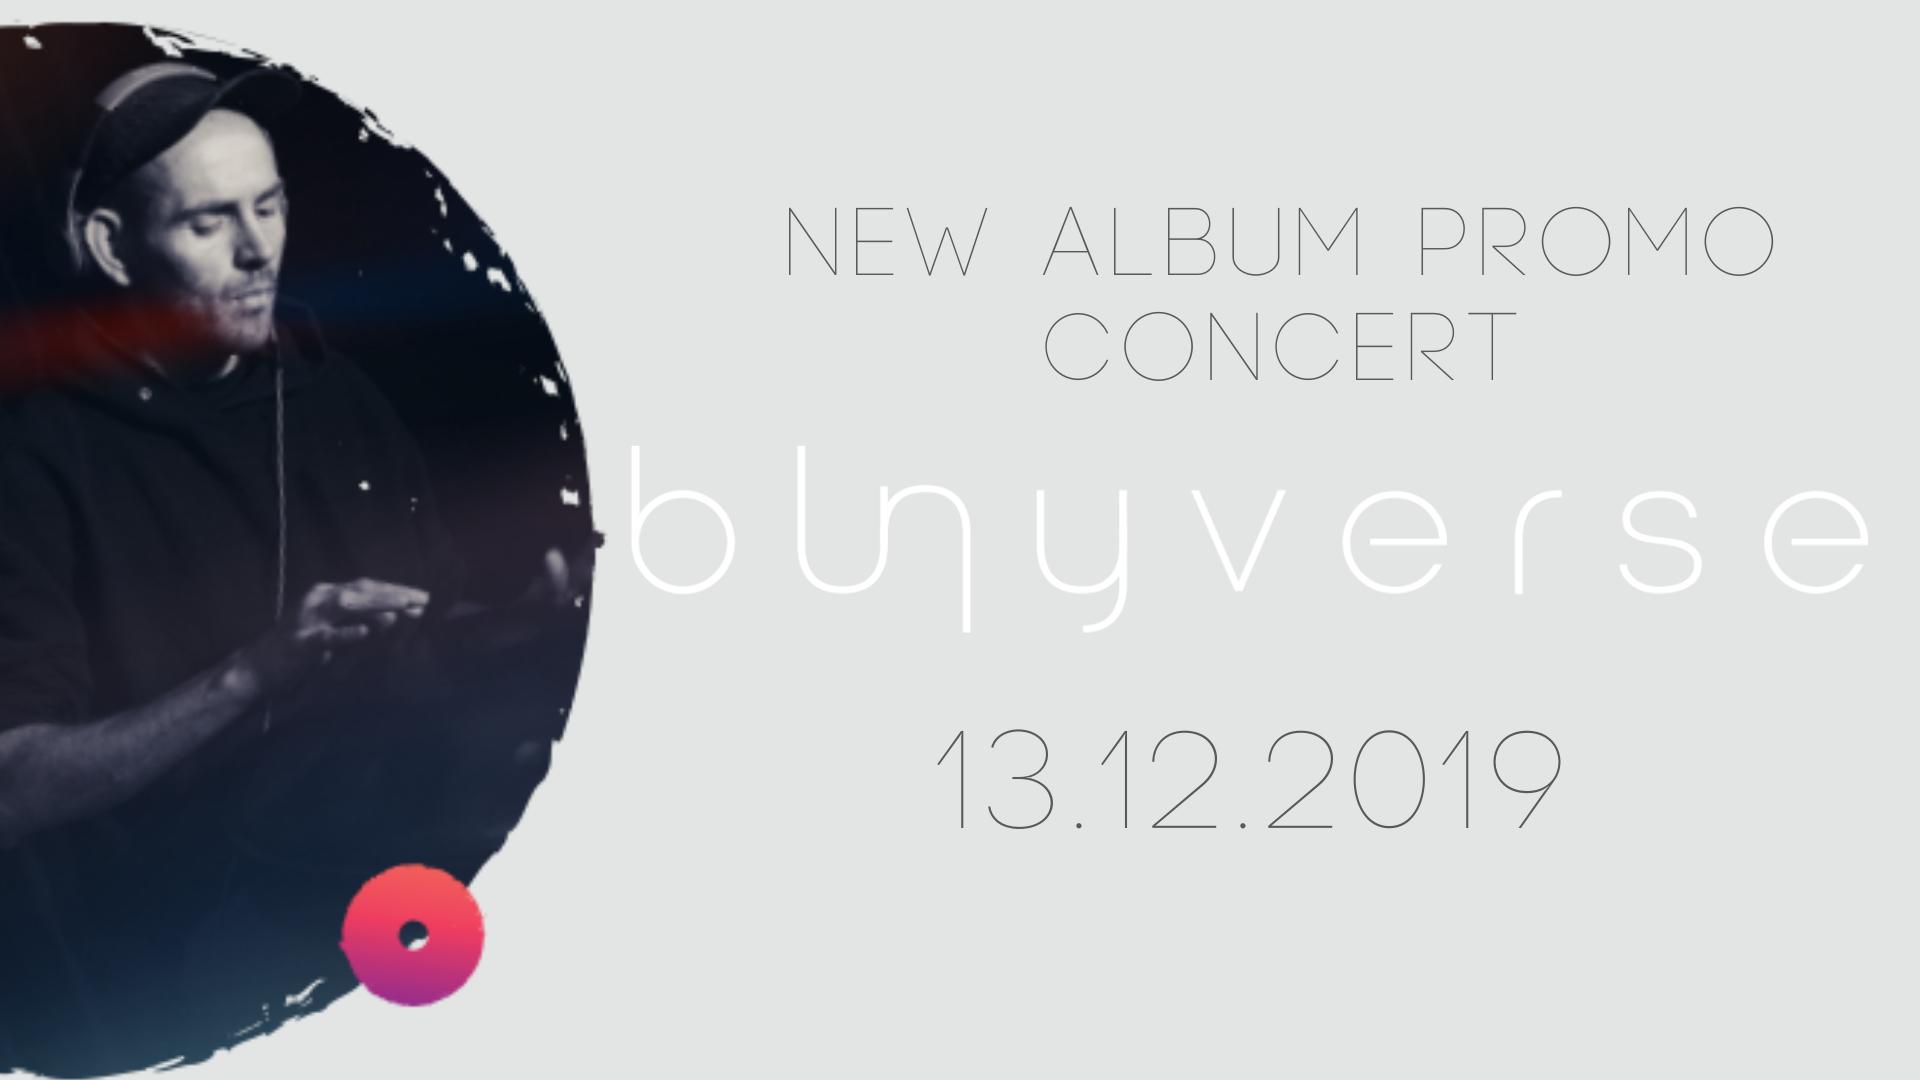 Bunyverse new album promo concert